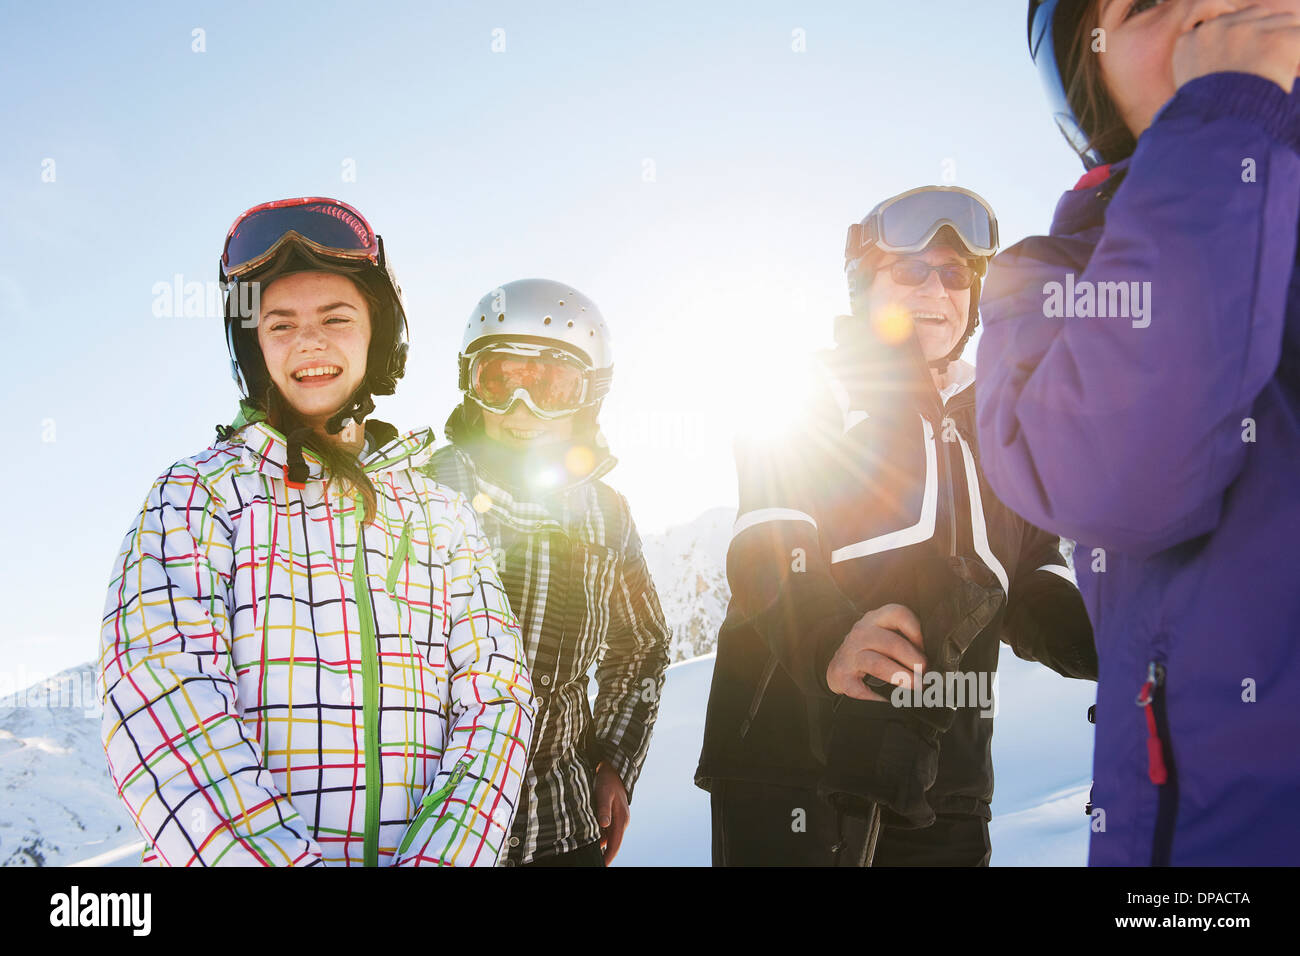 Grandparents and granddaughters, Les Arcs, Haute-Savoie, France - Stock Image